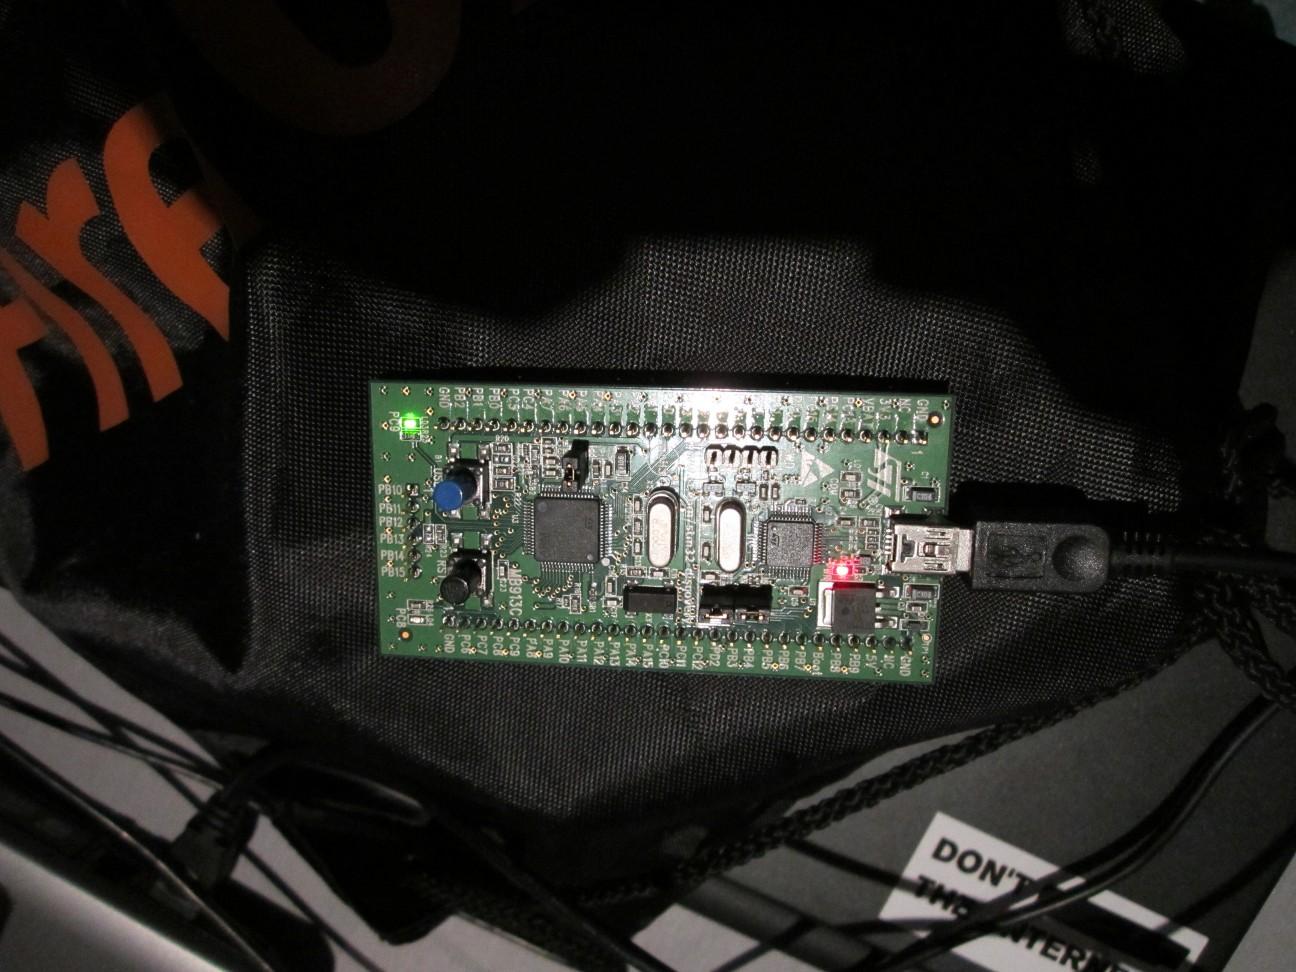 IP 17 11 2012 07